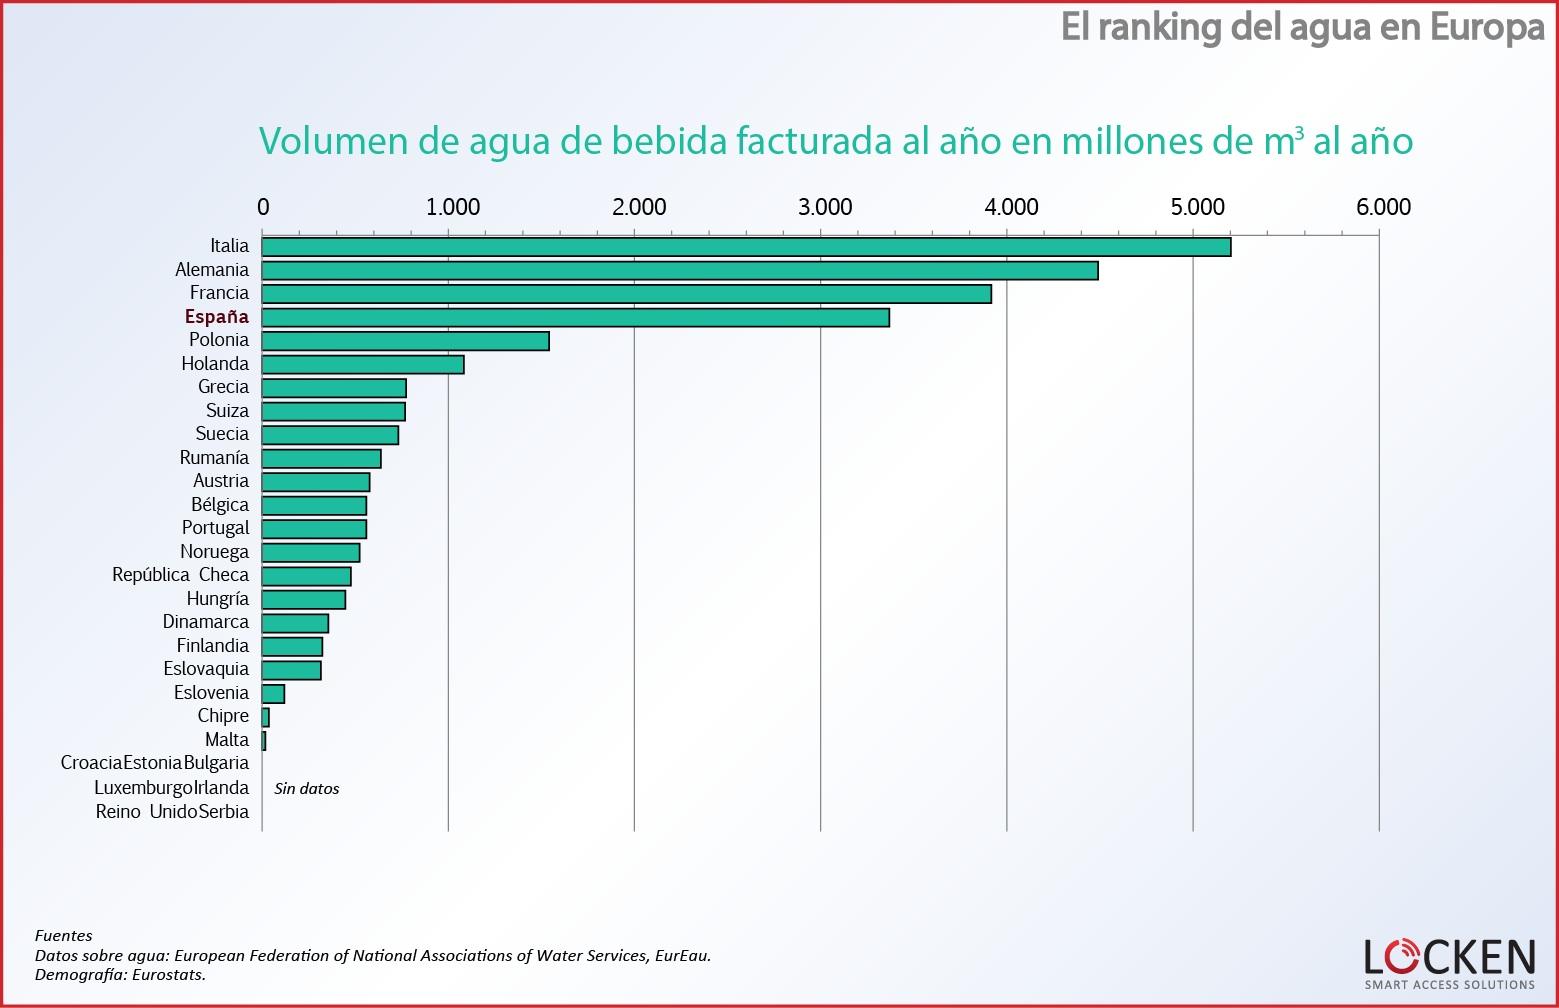 ranking-agua-europa-volumen-facturado